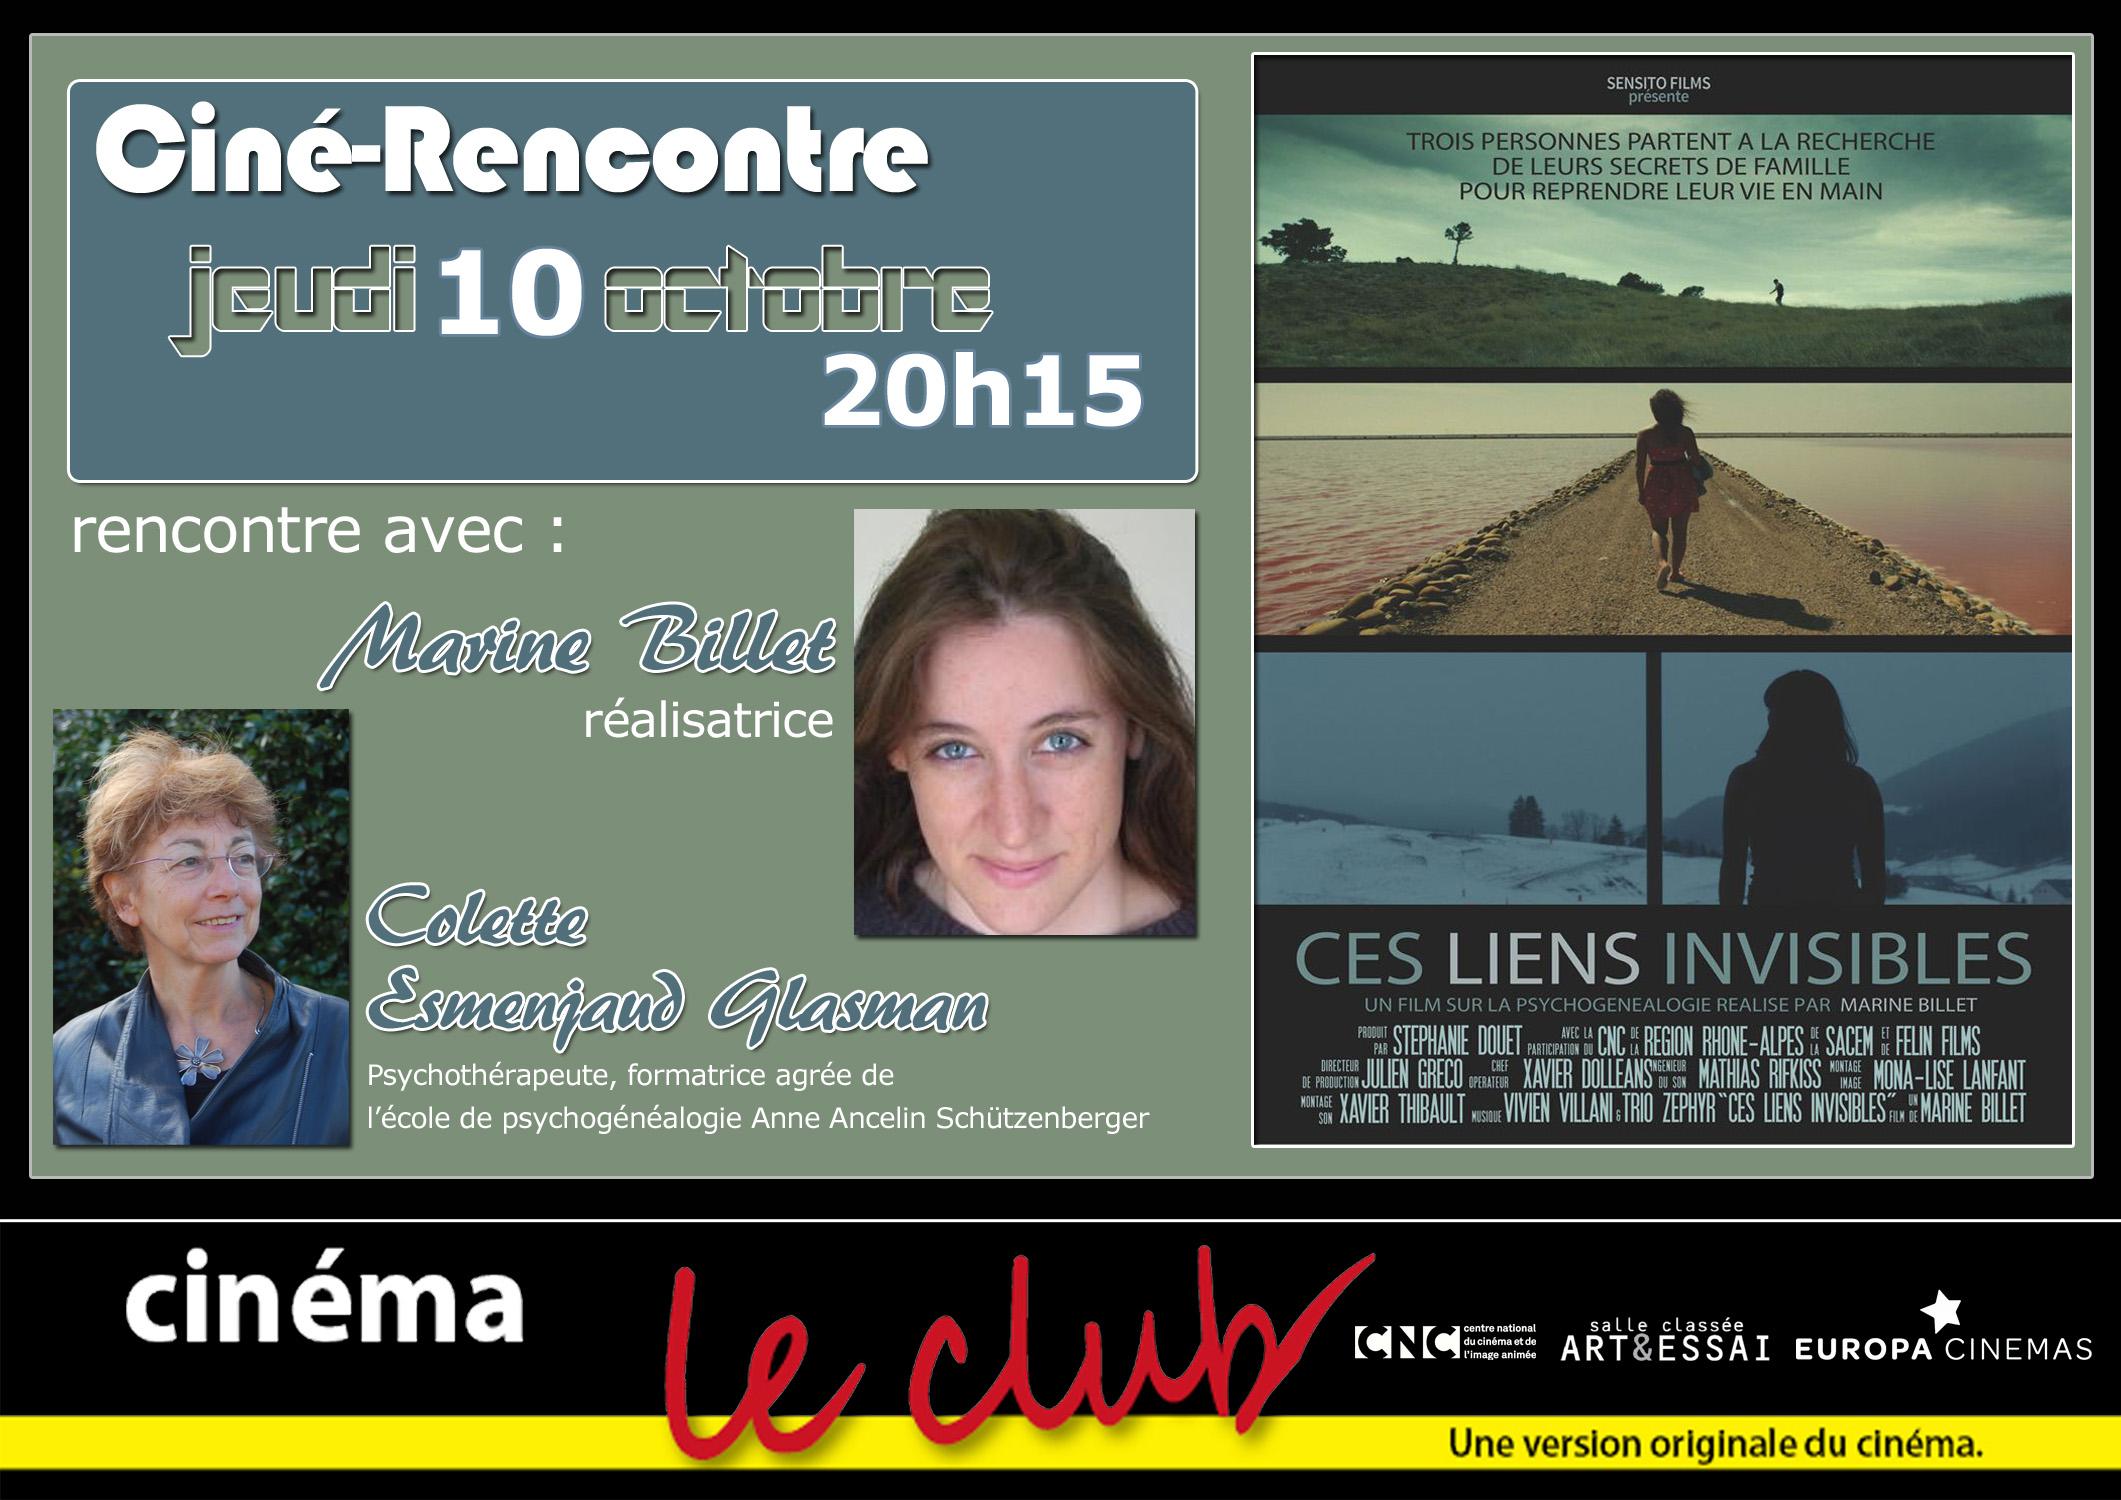 Art Et Essai Cinema Le Club